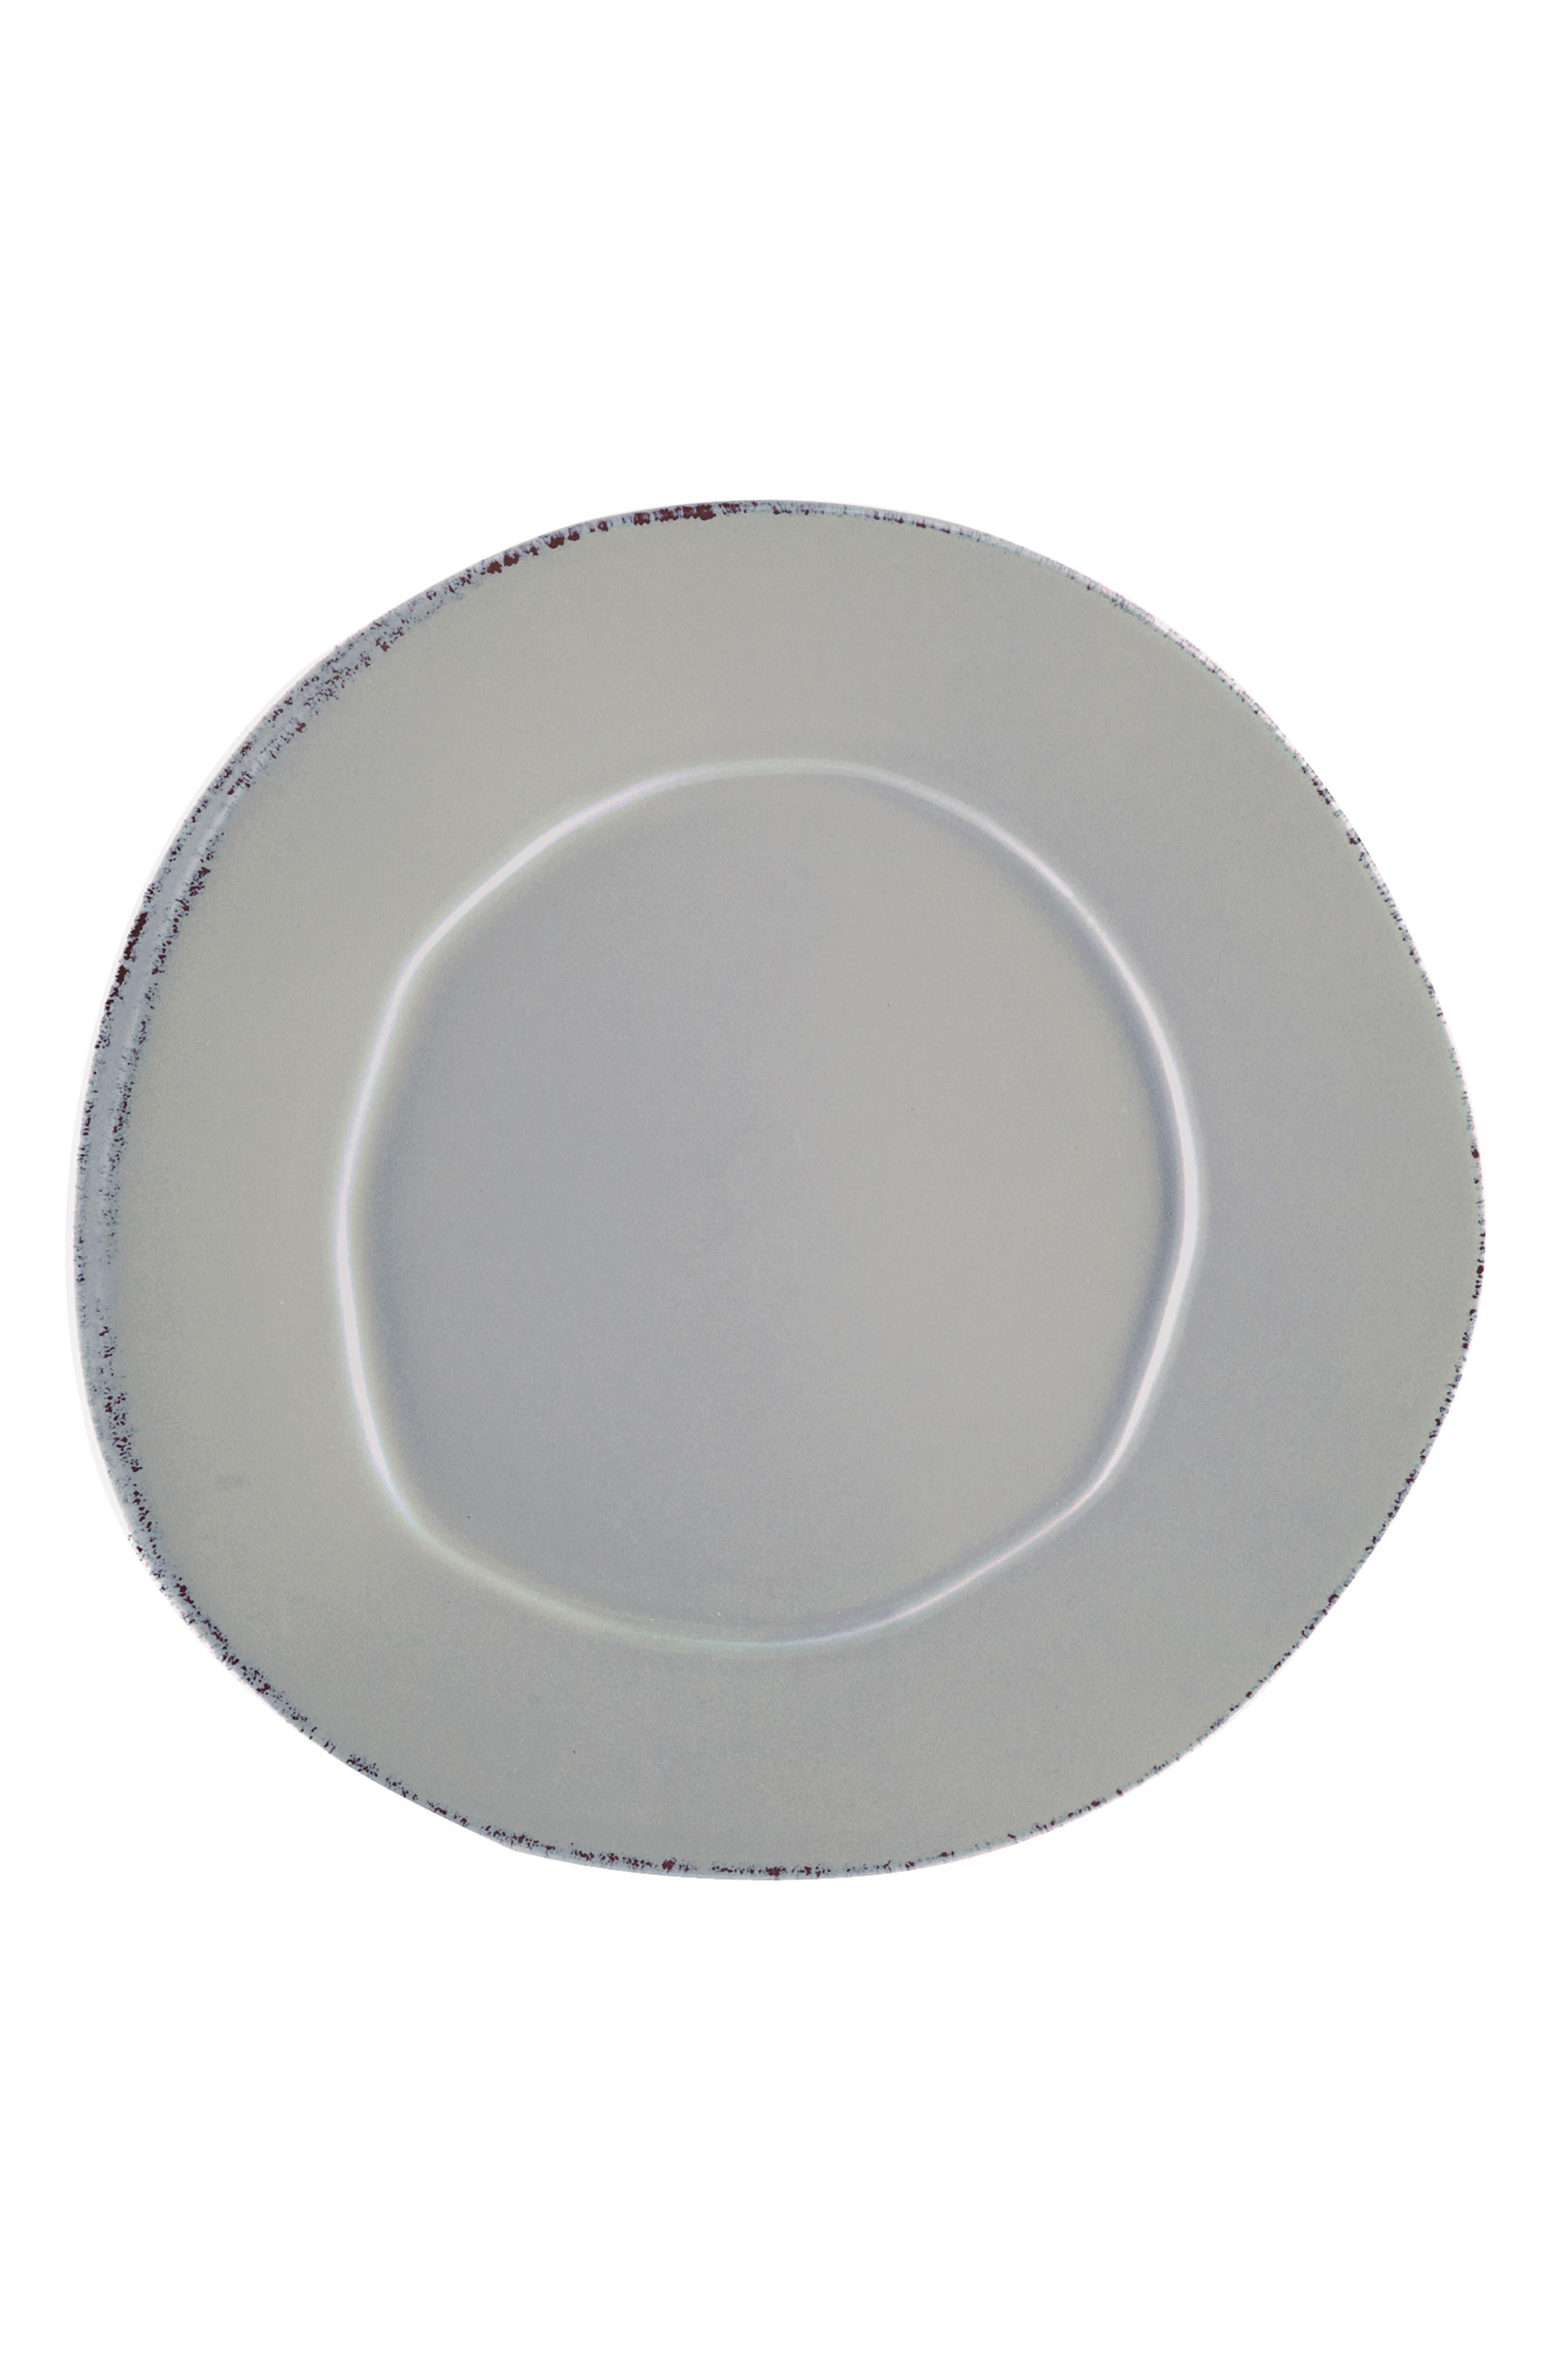 VIETRI Lastra Stoneware Dinner Plate  sc 1 st  Nordstrom & Dinnerware: Dishes Plates \u0026 Bowls